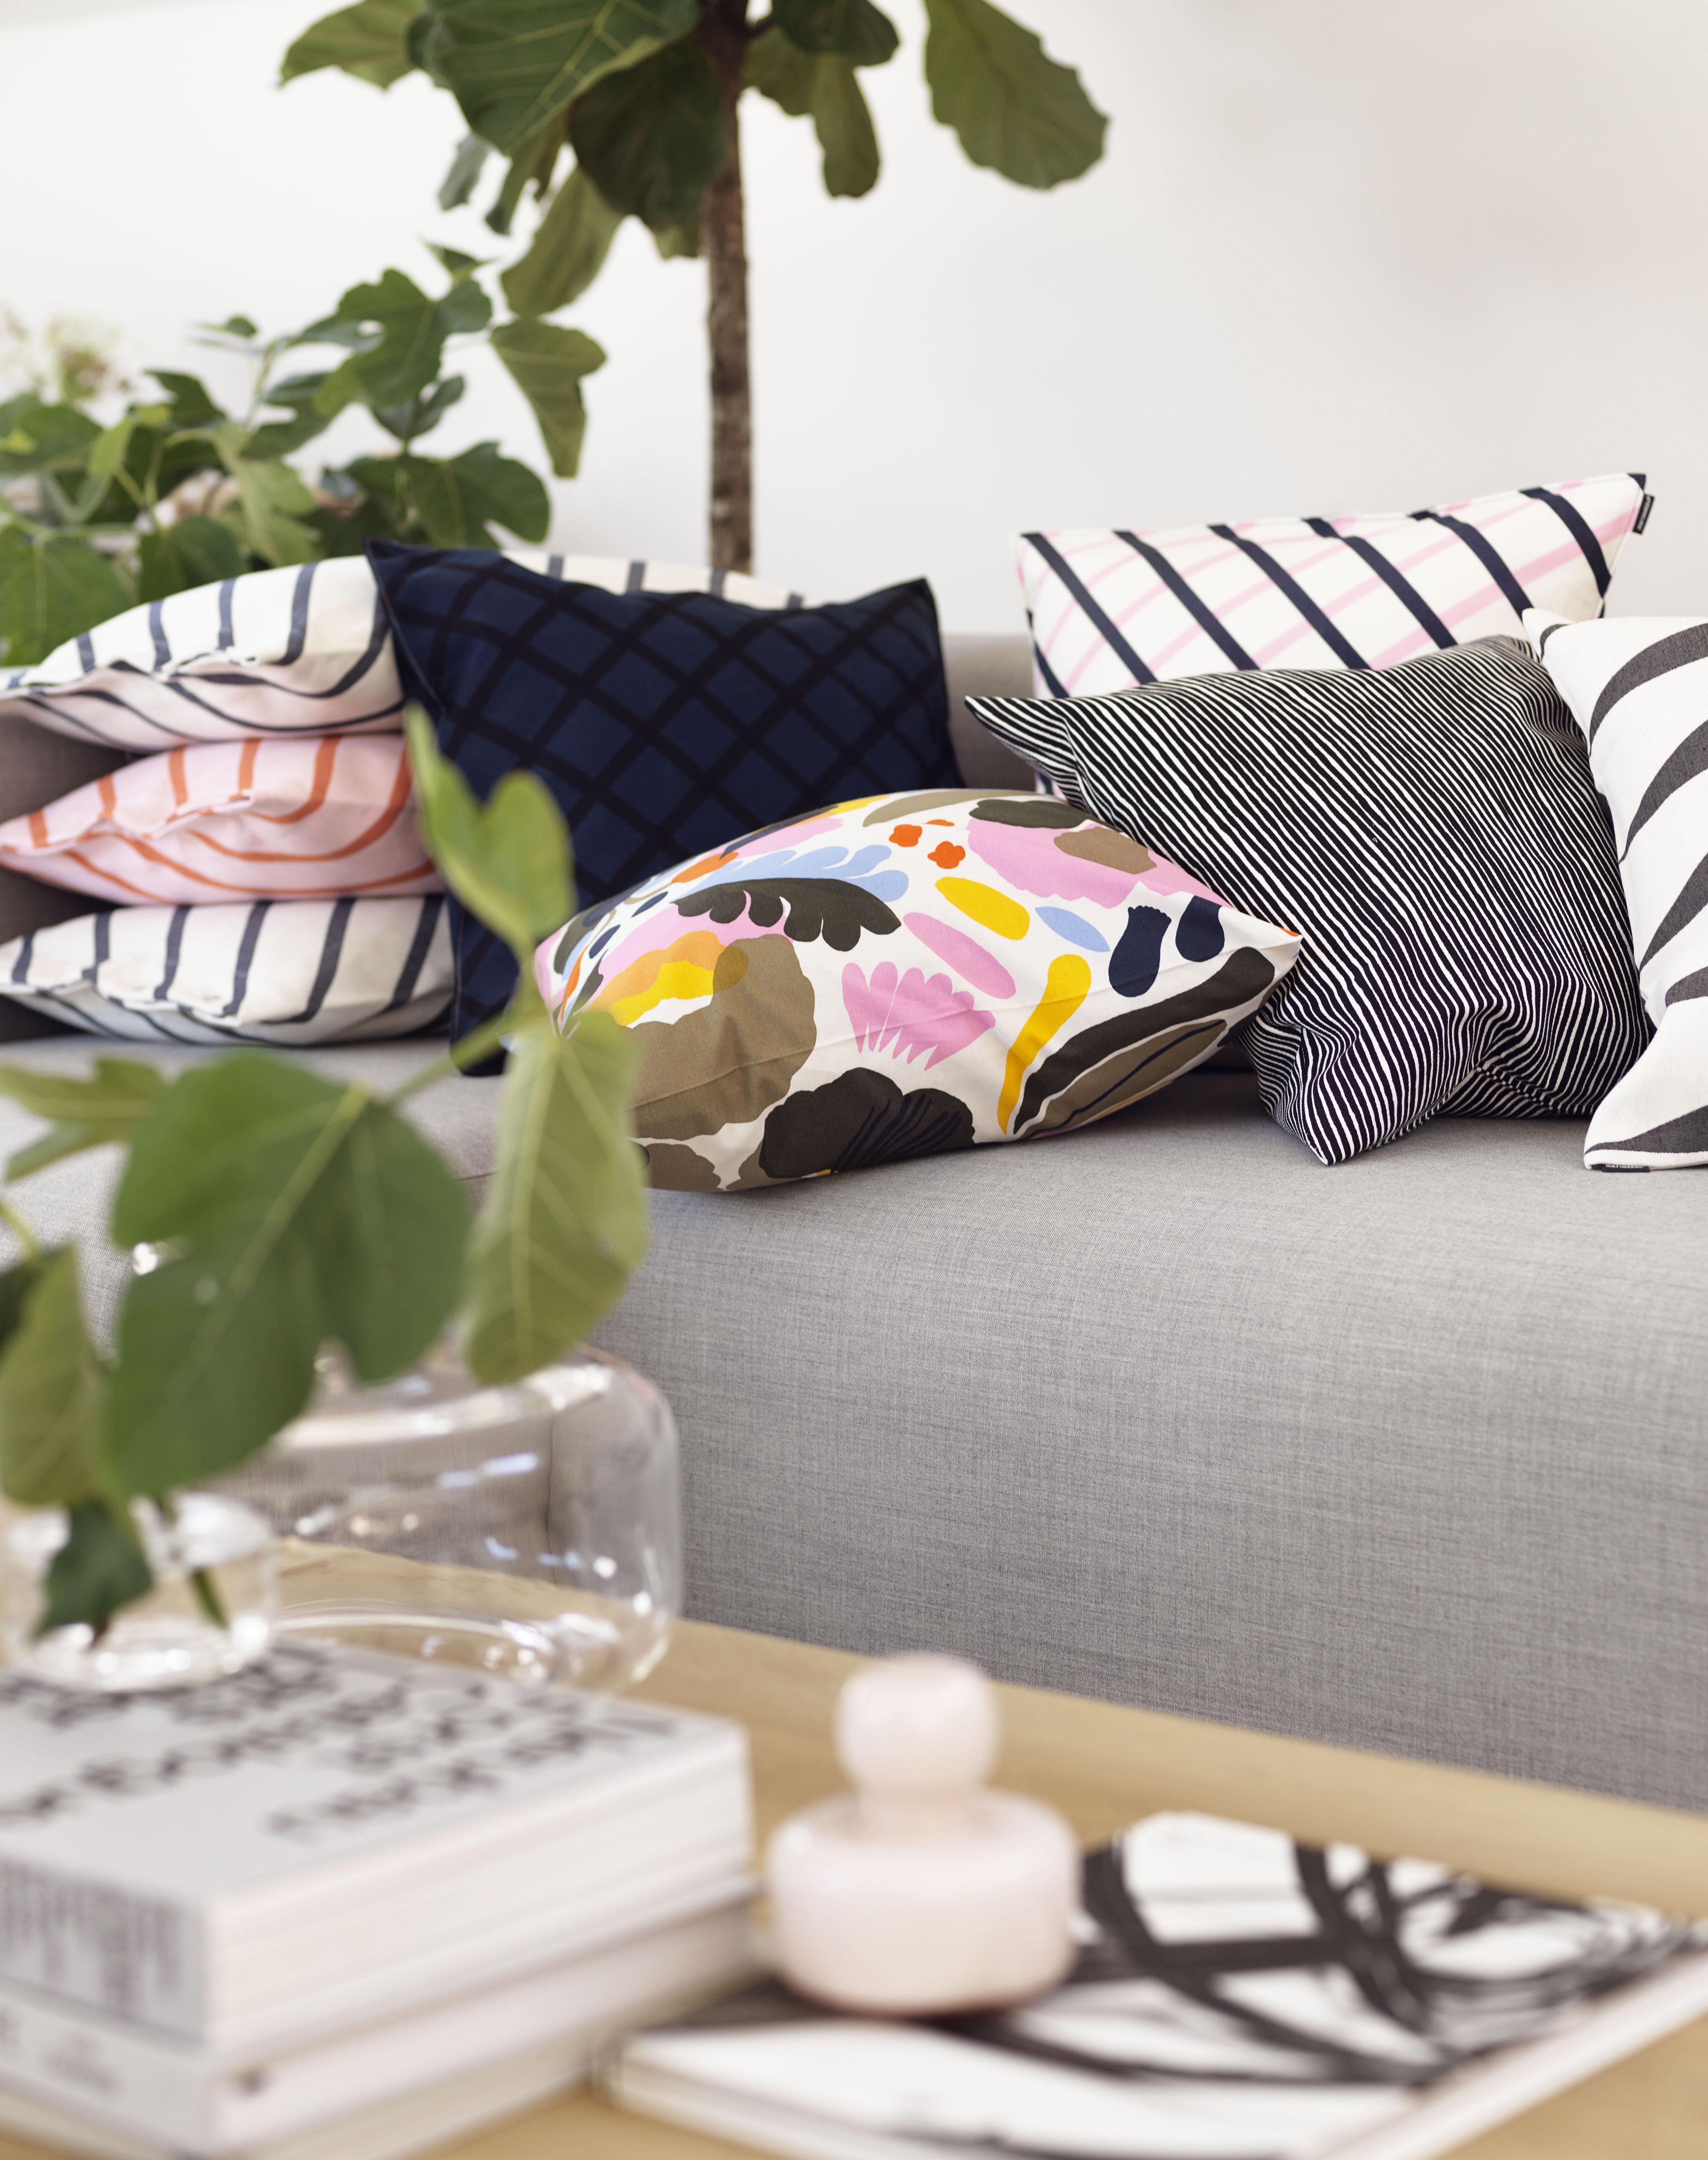 fayette furniture unikko blue bedding bed marimekko design